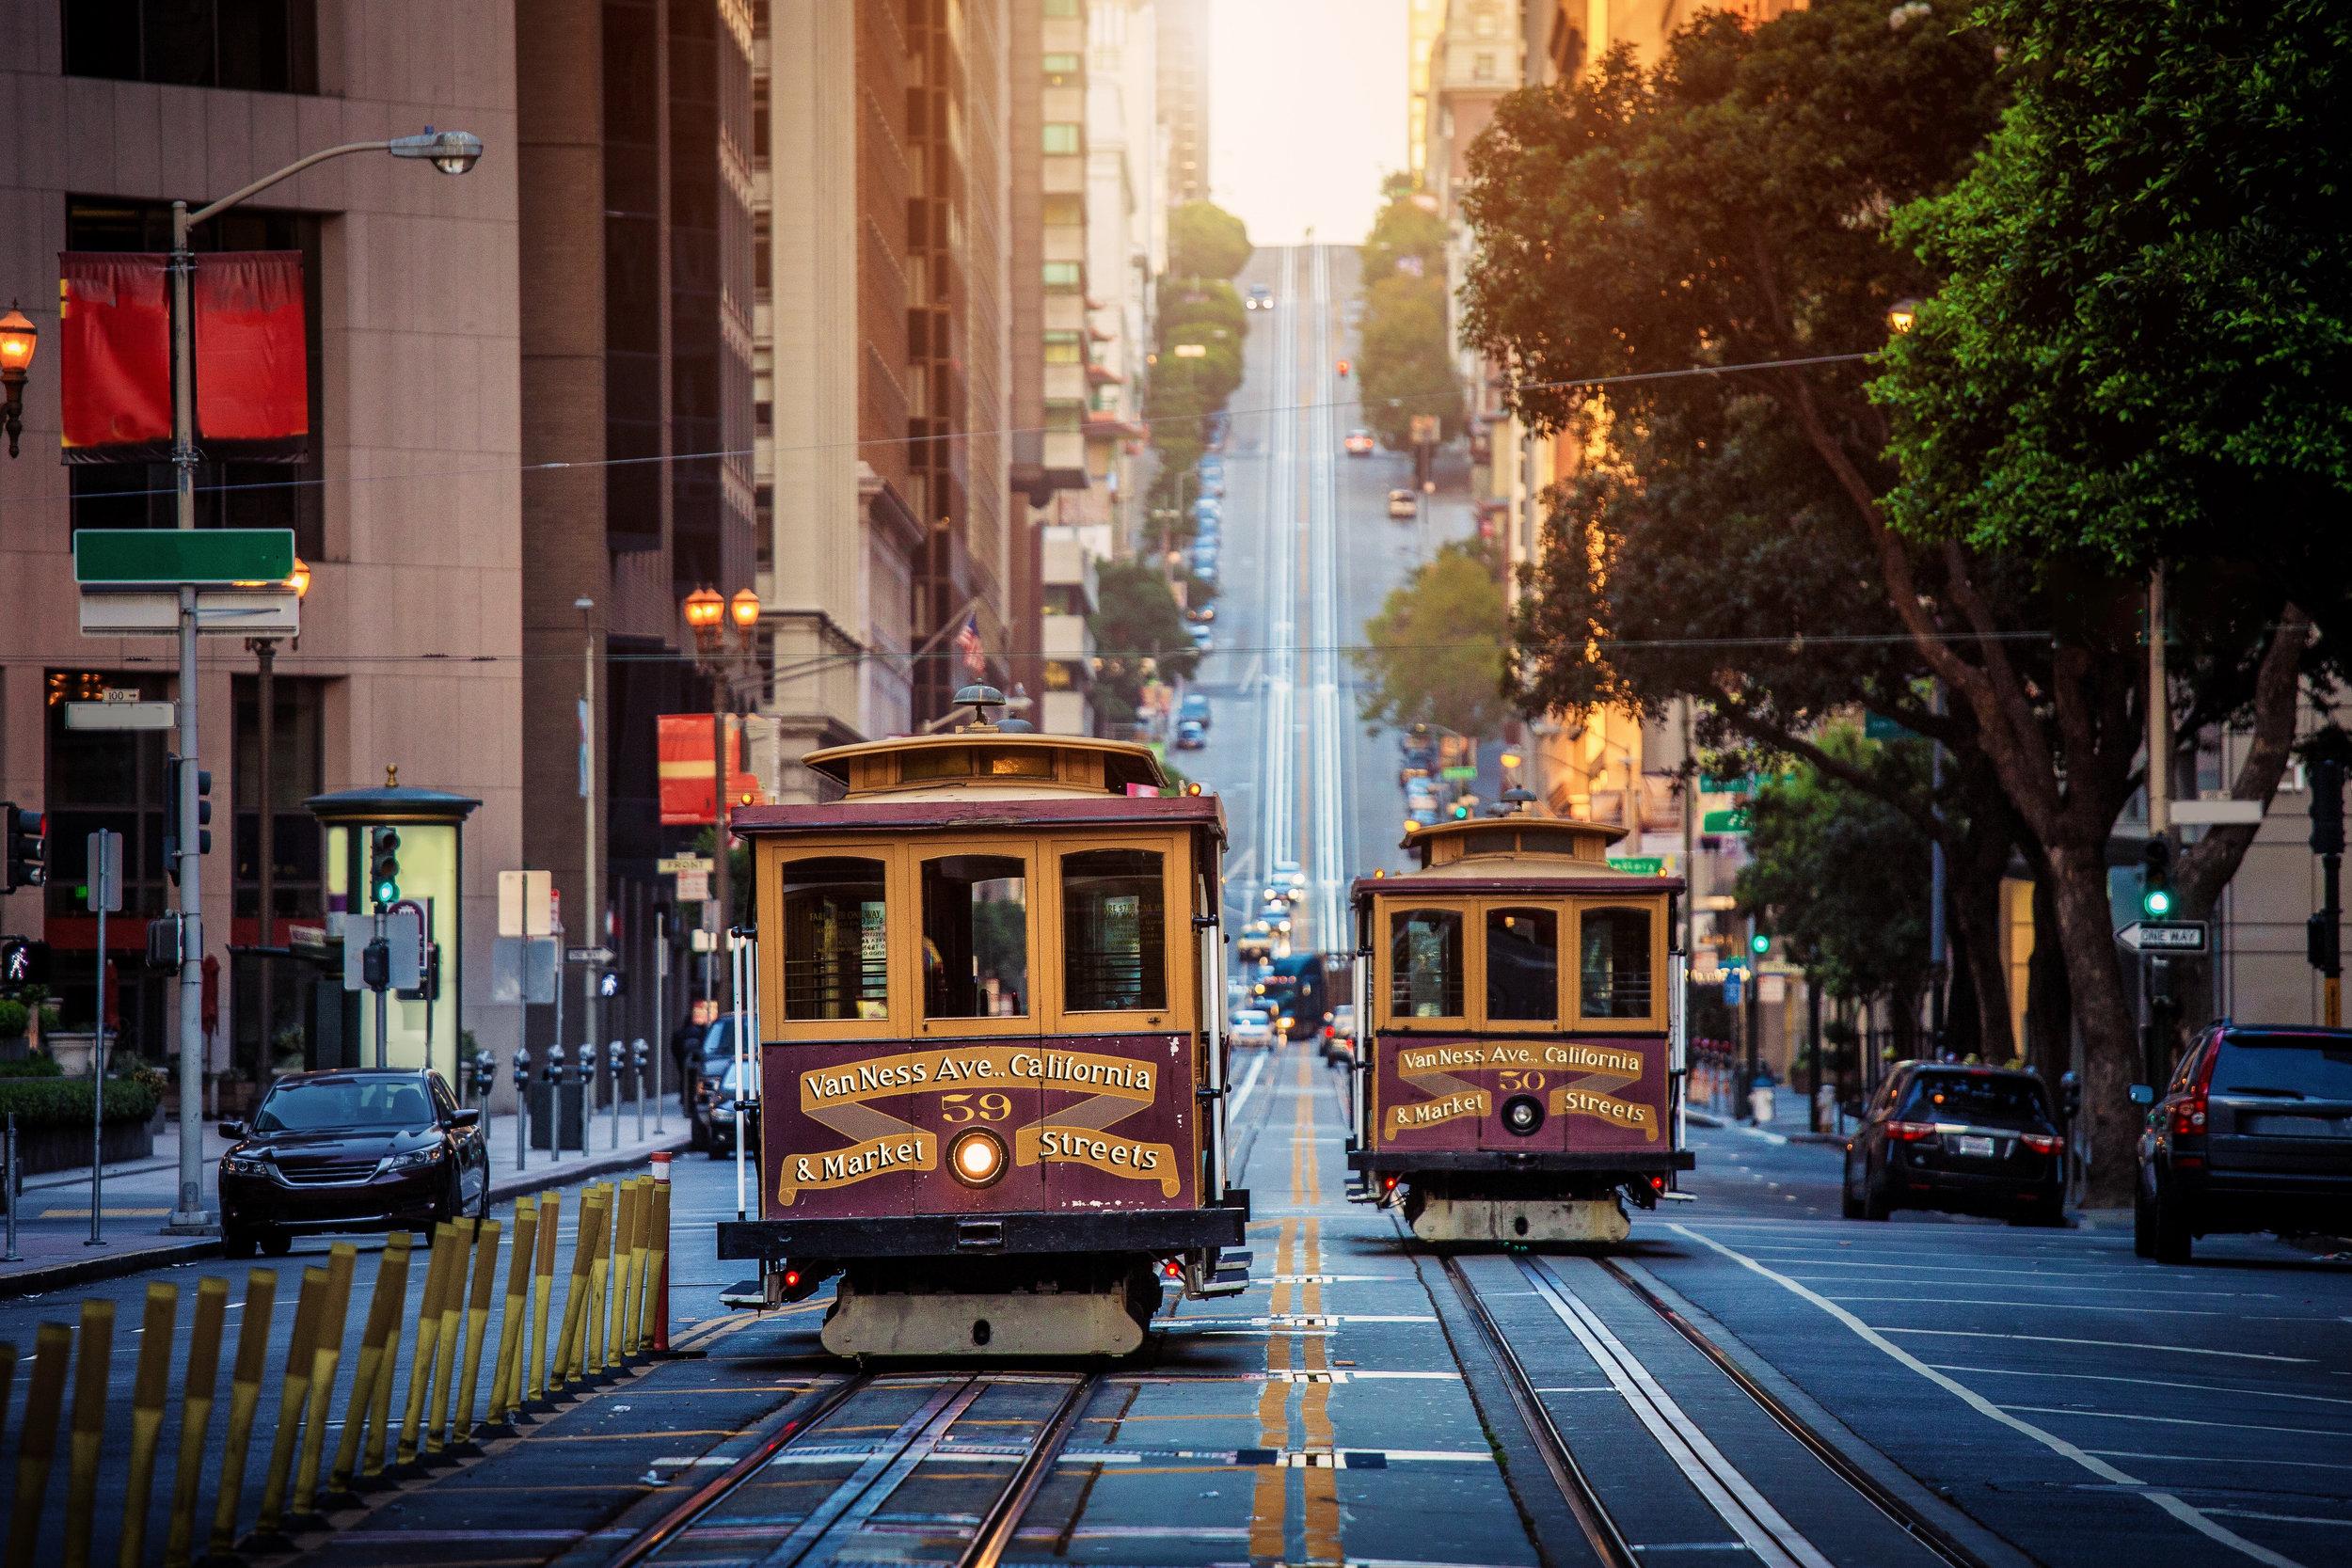 bigstock-San-Francisco-Cable-Cars-On-Ca-176211004.jpg